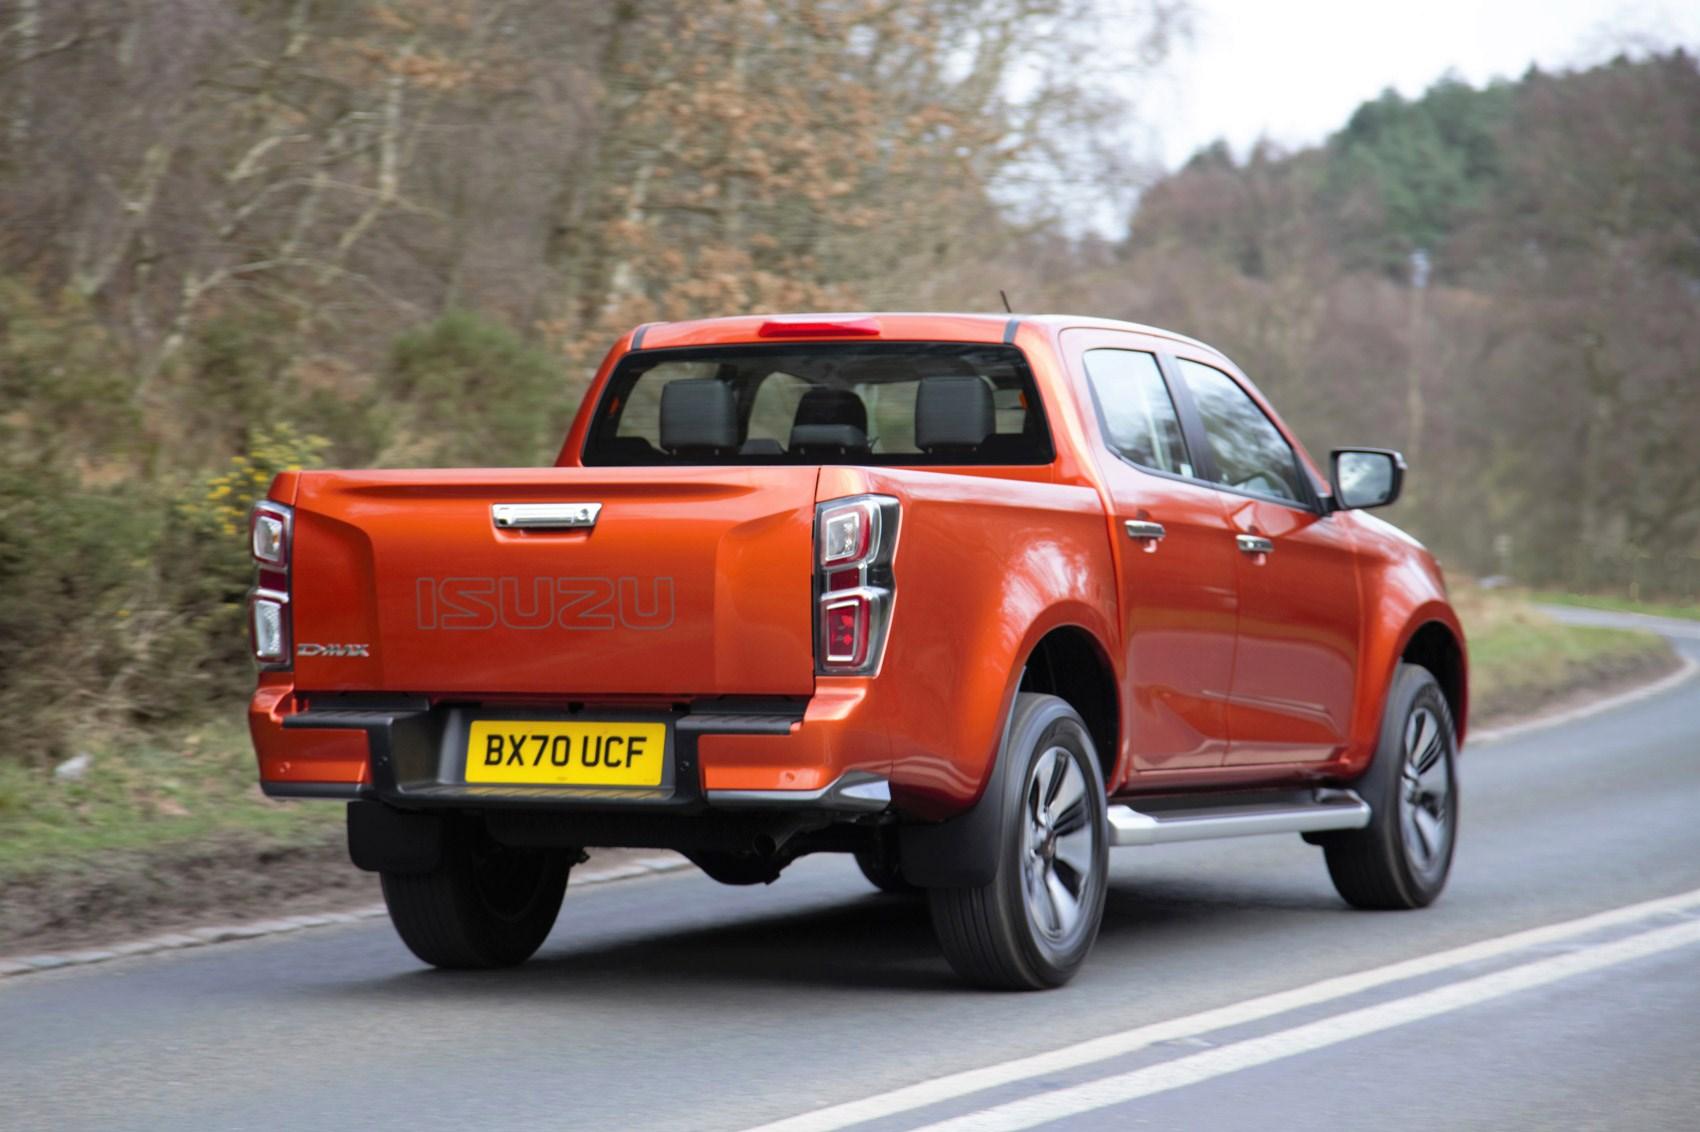 Isuzu D-Max review, 2021, DL40, rear view, driving, orange